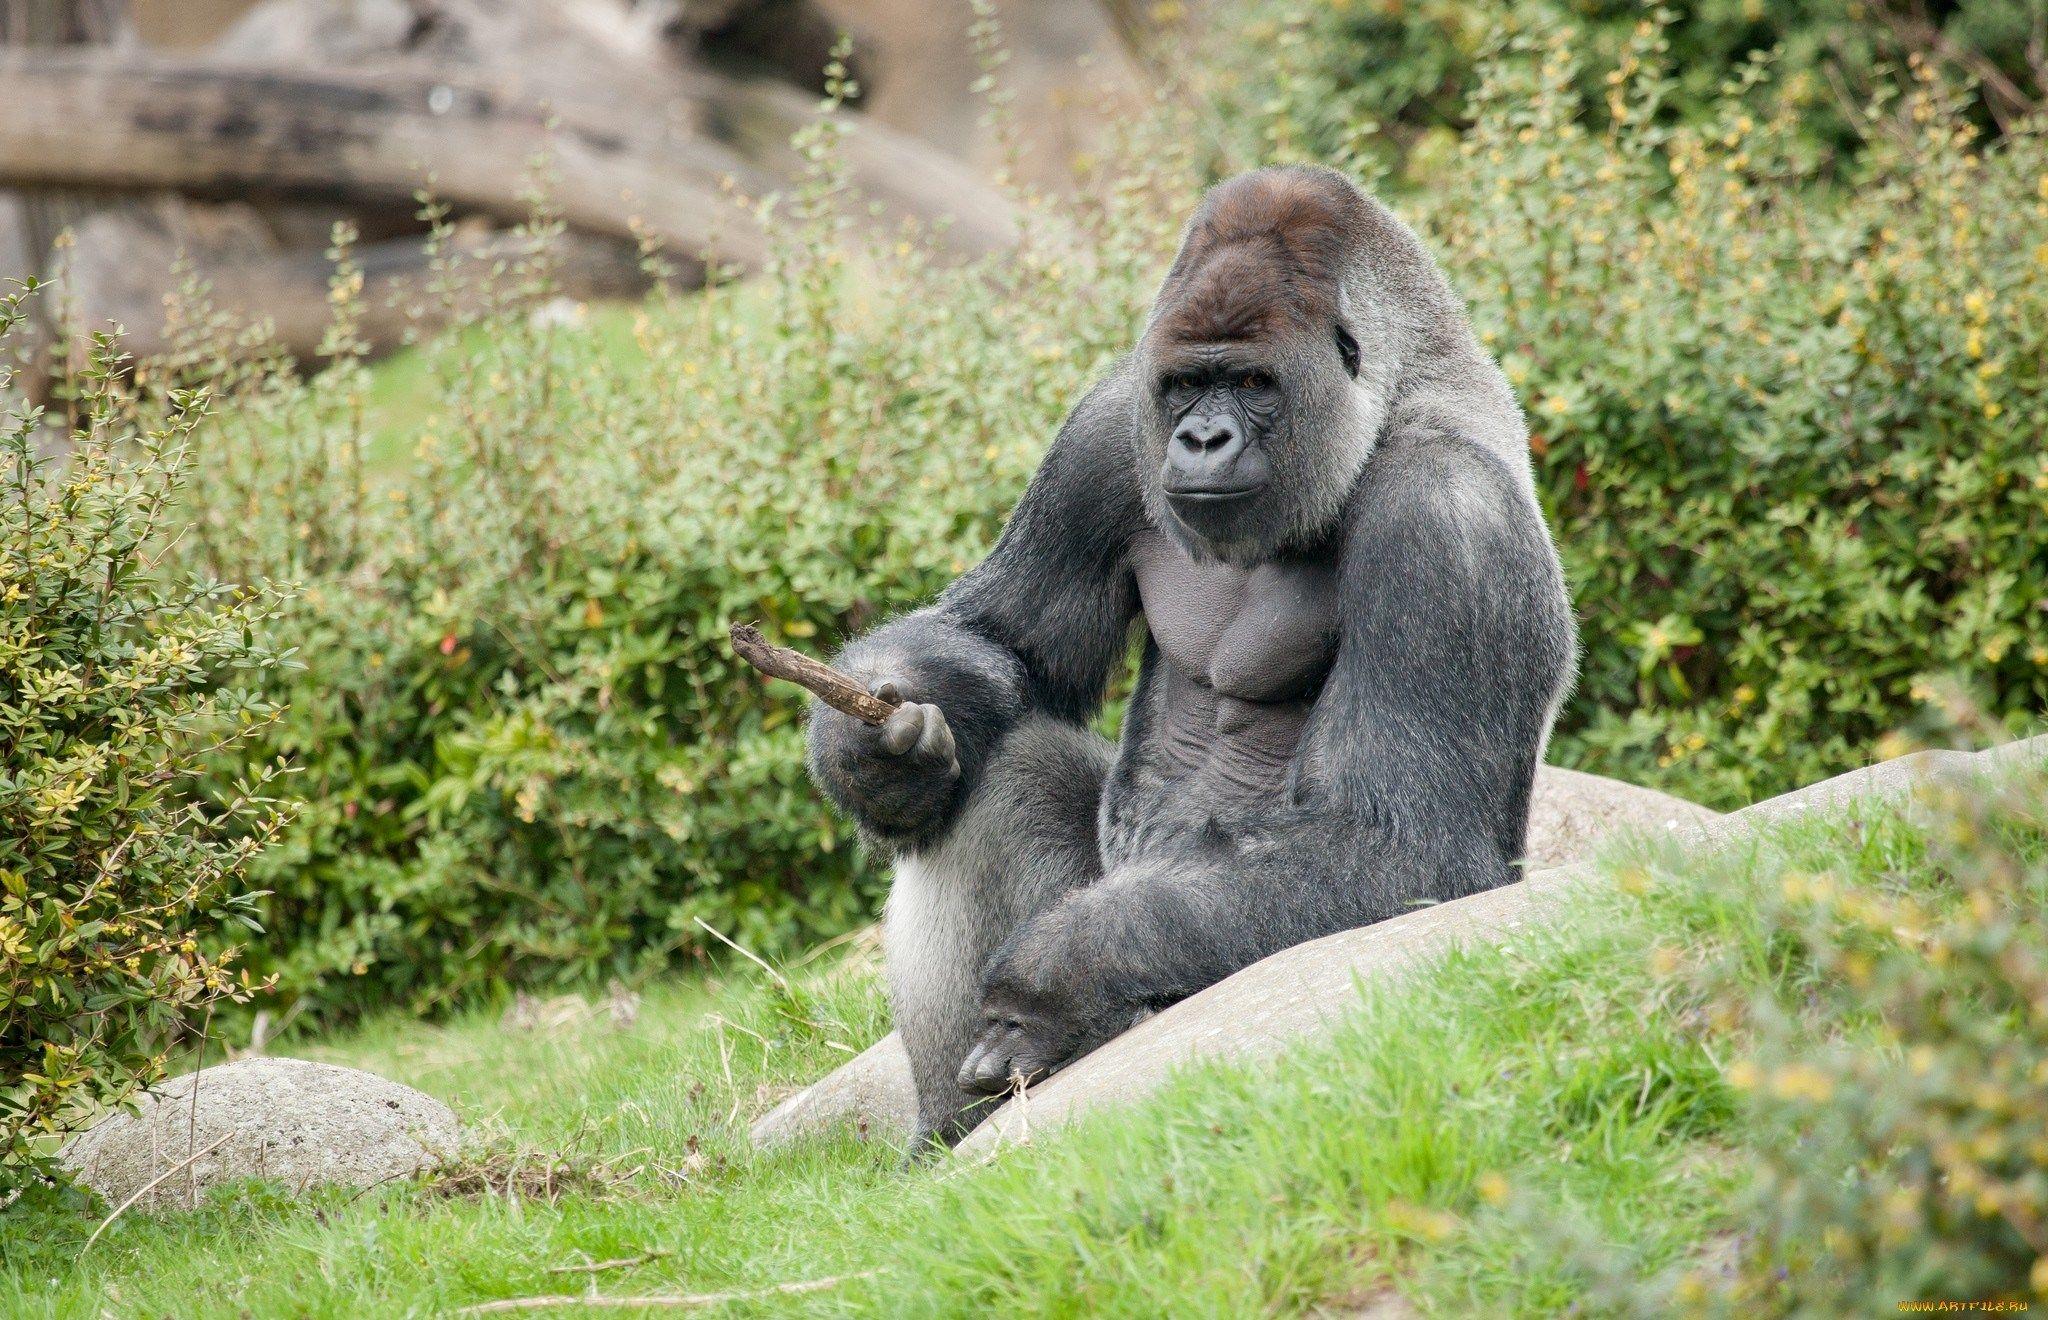 Gorilla Images For Desktop Background Tyler Turner 2017 03 14 Gorilla Wallpaper Gorilla Animals